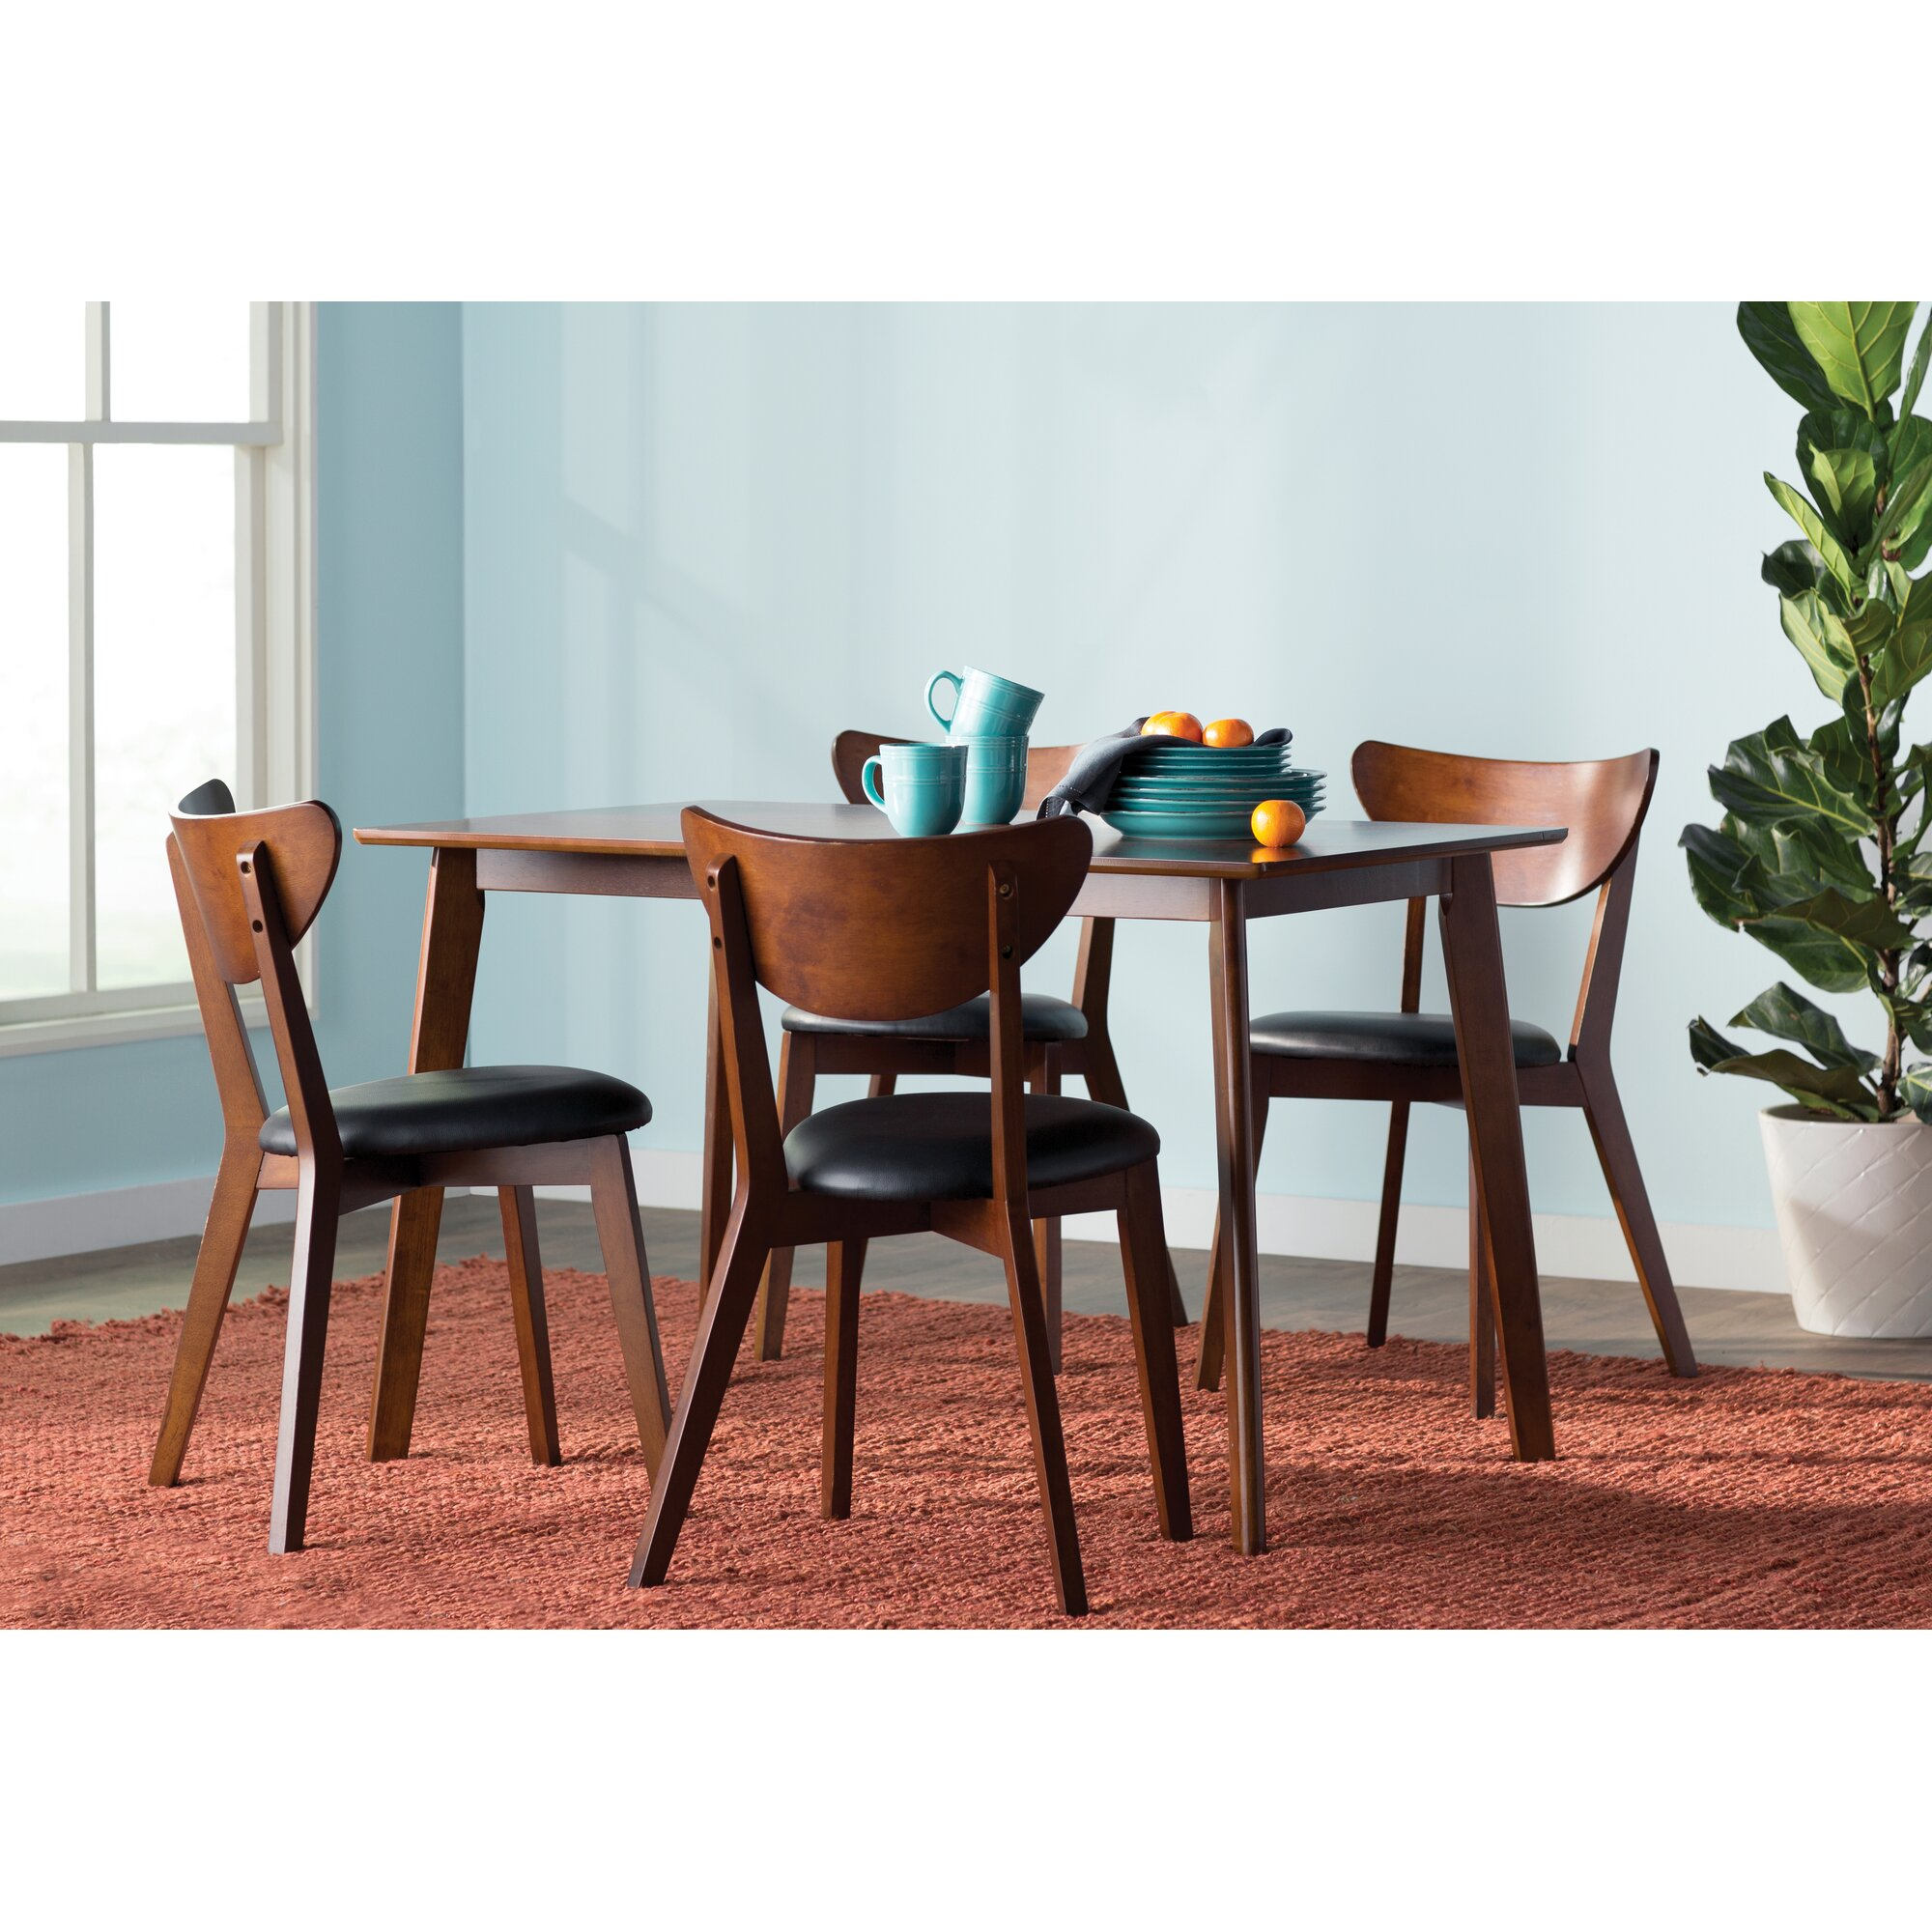 Wholesale Interiors Baxton Studio Sumner 5 Piece Dining Set ...